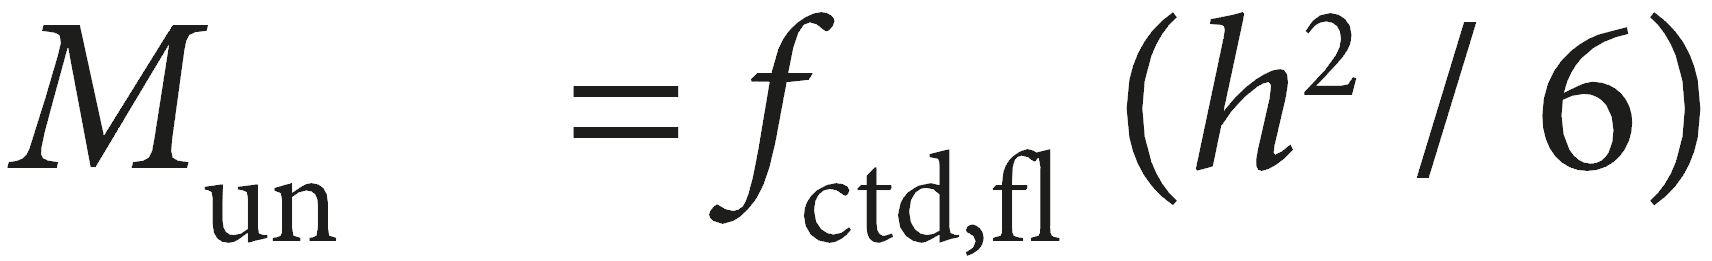 Hetenyi Method - TR34 Line Load Equation2